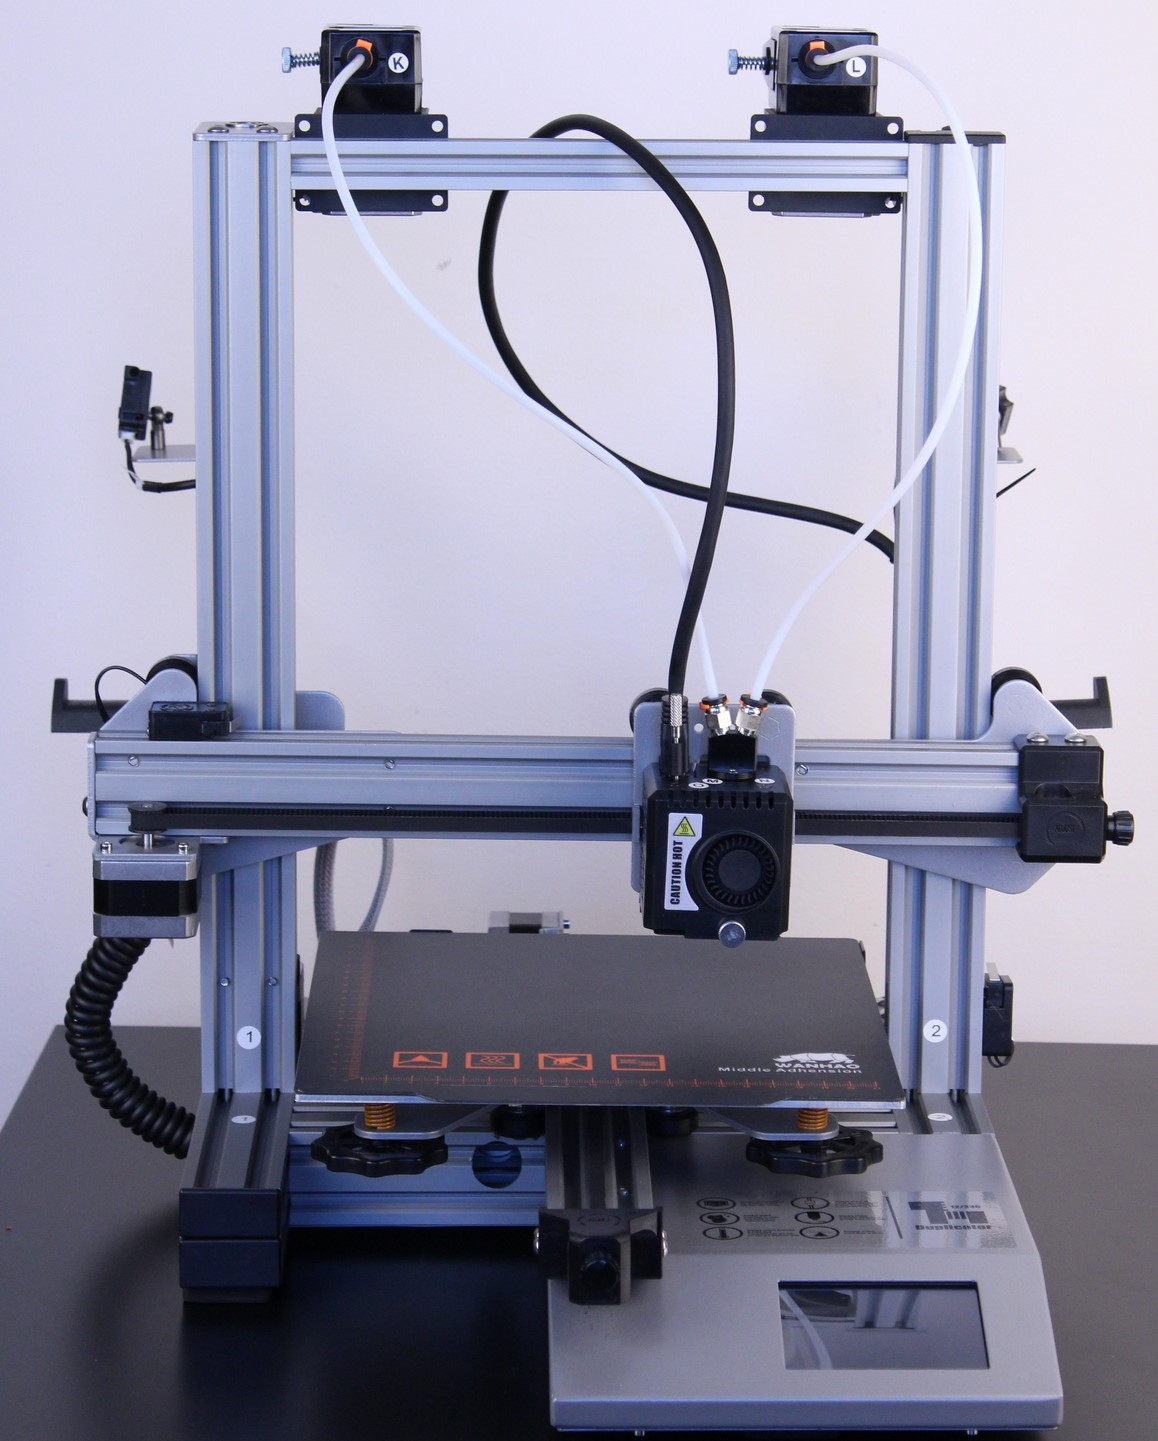 Wanhao-Duplicator-D12-230-Design-1